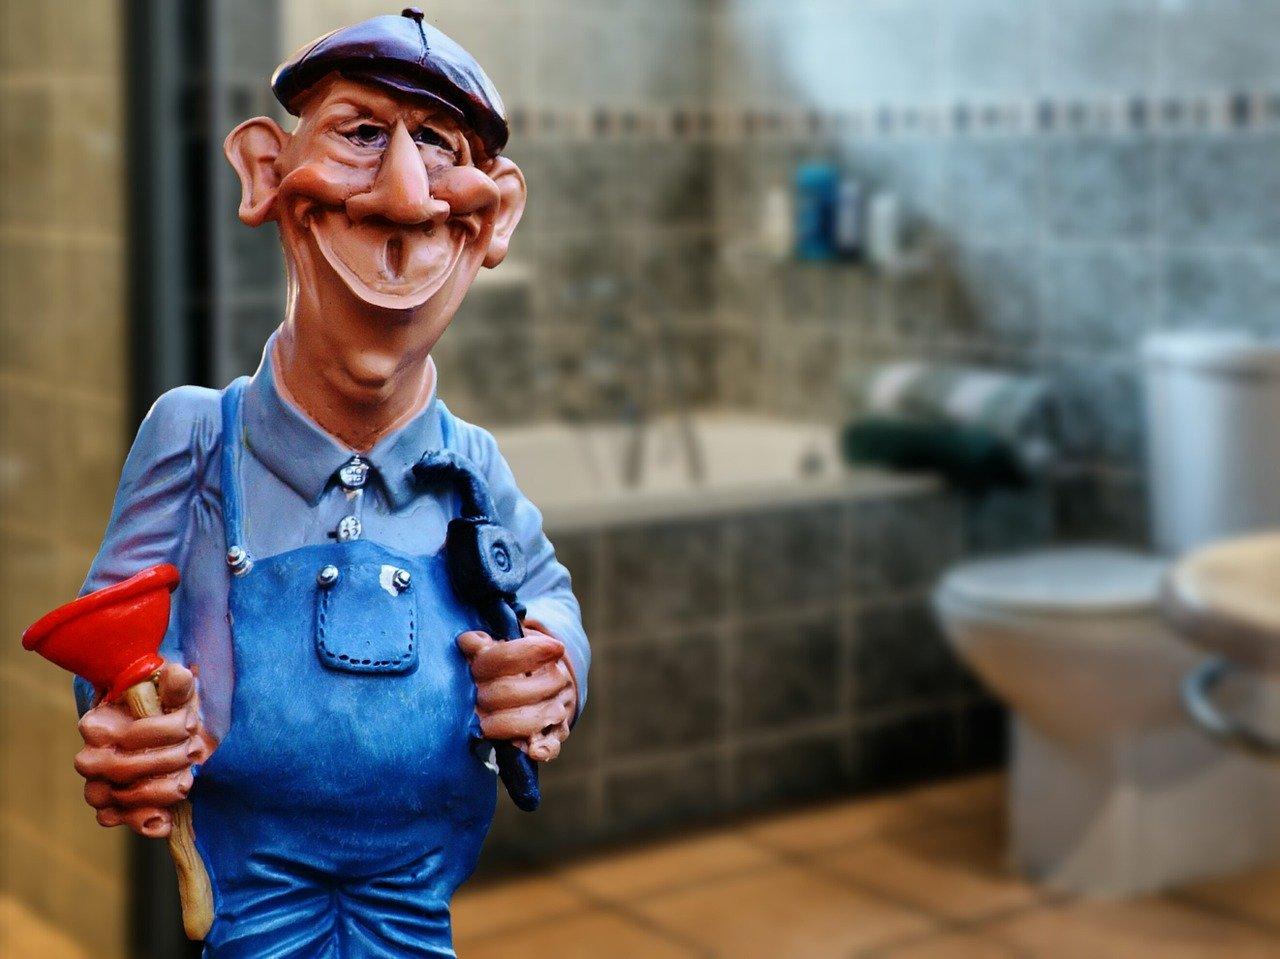 plumber, janitor, pömpel